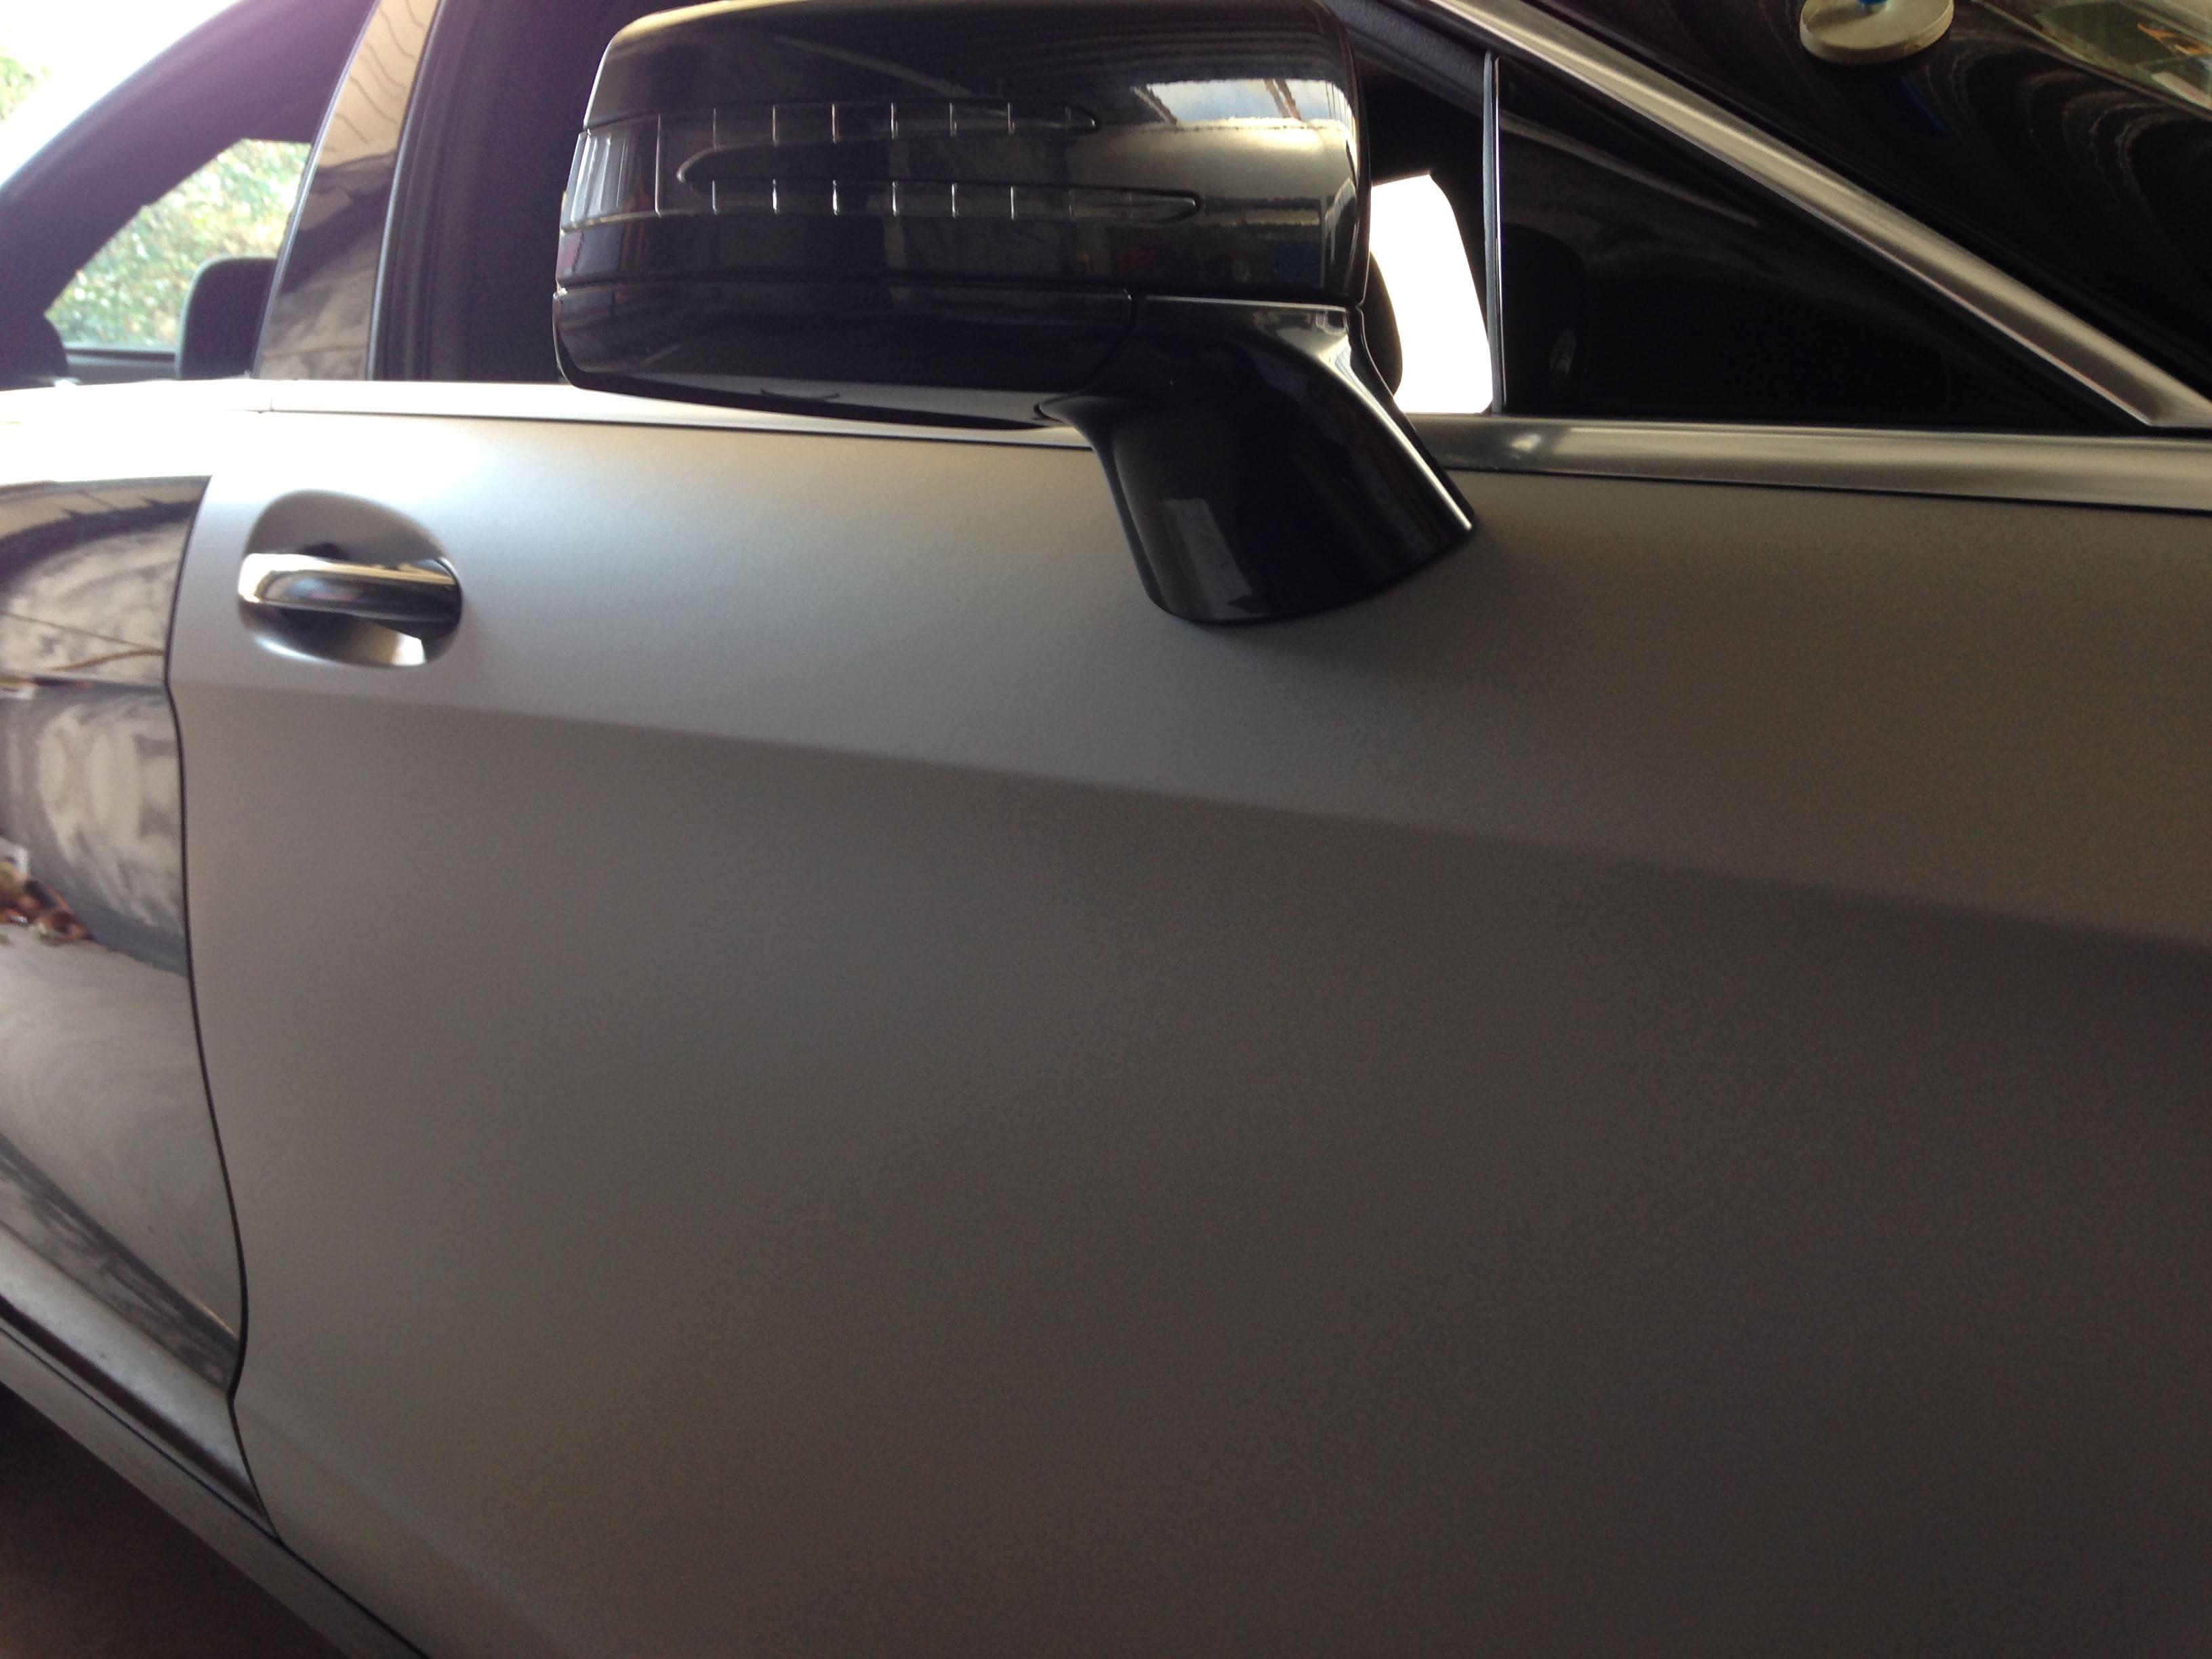 Mercedes CLS met Mat Grey Aluminium Wrap, Carwrapping door Wrapmyride.nu Foto-nr:6129, ©2020